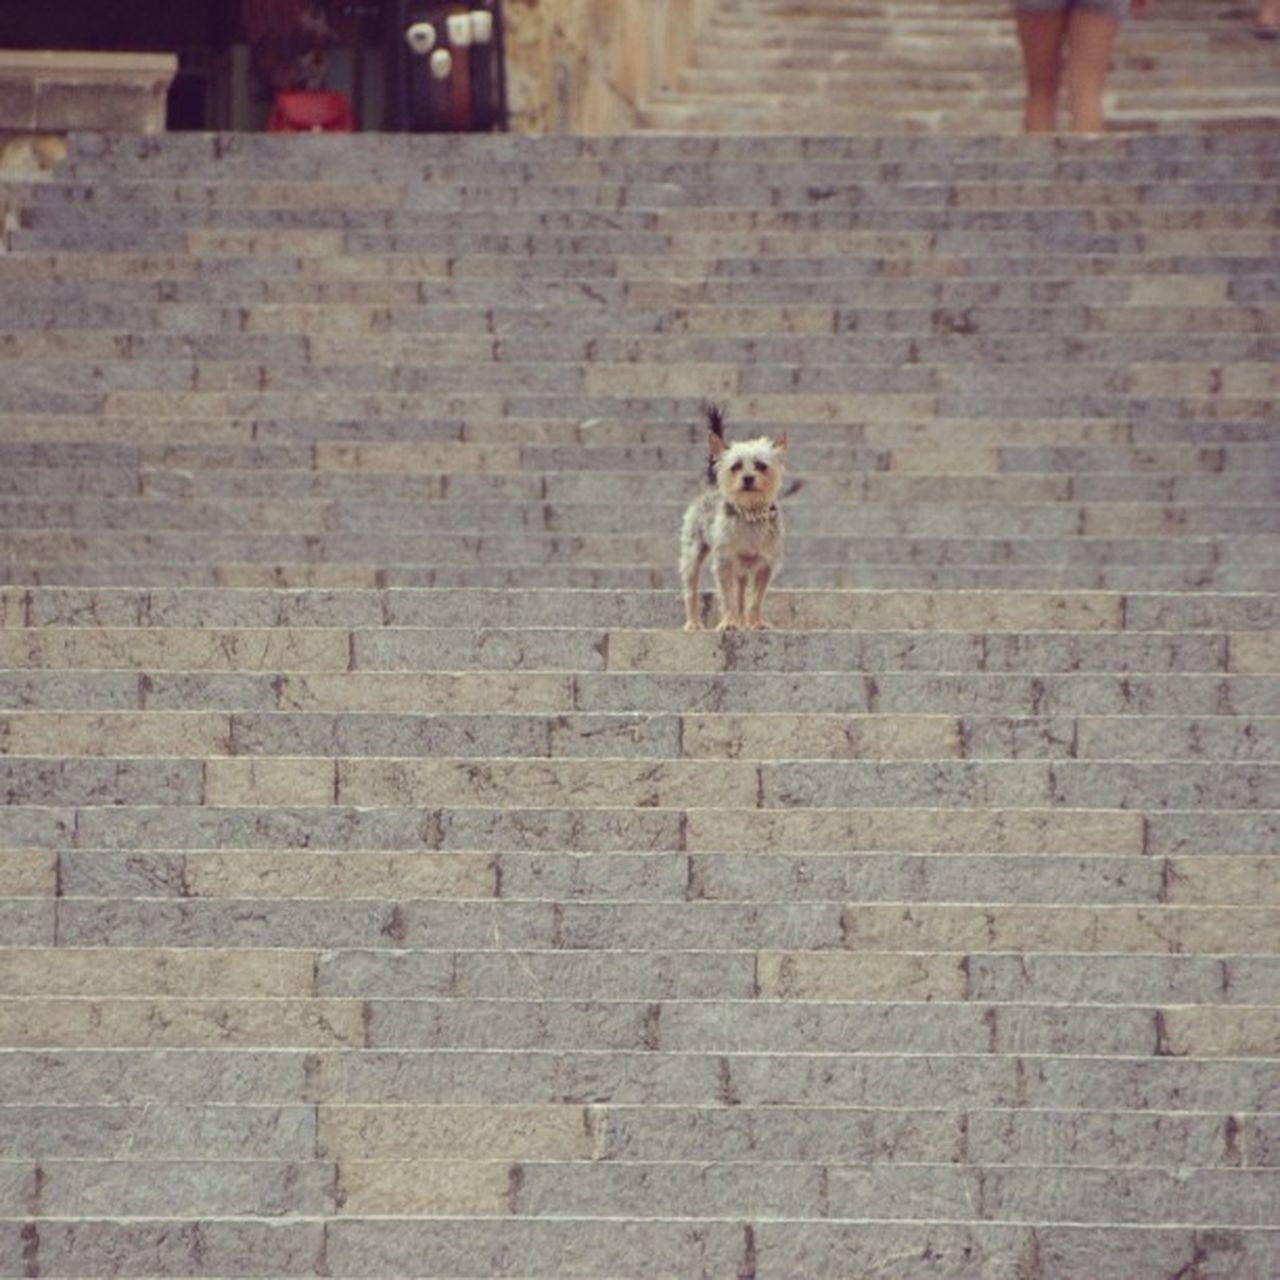 Cutest Dog Dogdays Hot Summer Vacation Holiday Holidays SPAIN Mallorca Island España Animal Pet Love Instadogs Dogsofinstagram Dogotd POTD Dailydog Dogstagram Colors Photography Nikon Happy stairs toninton